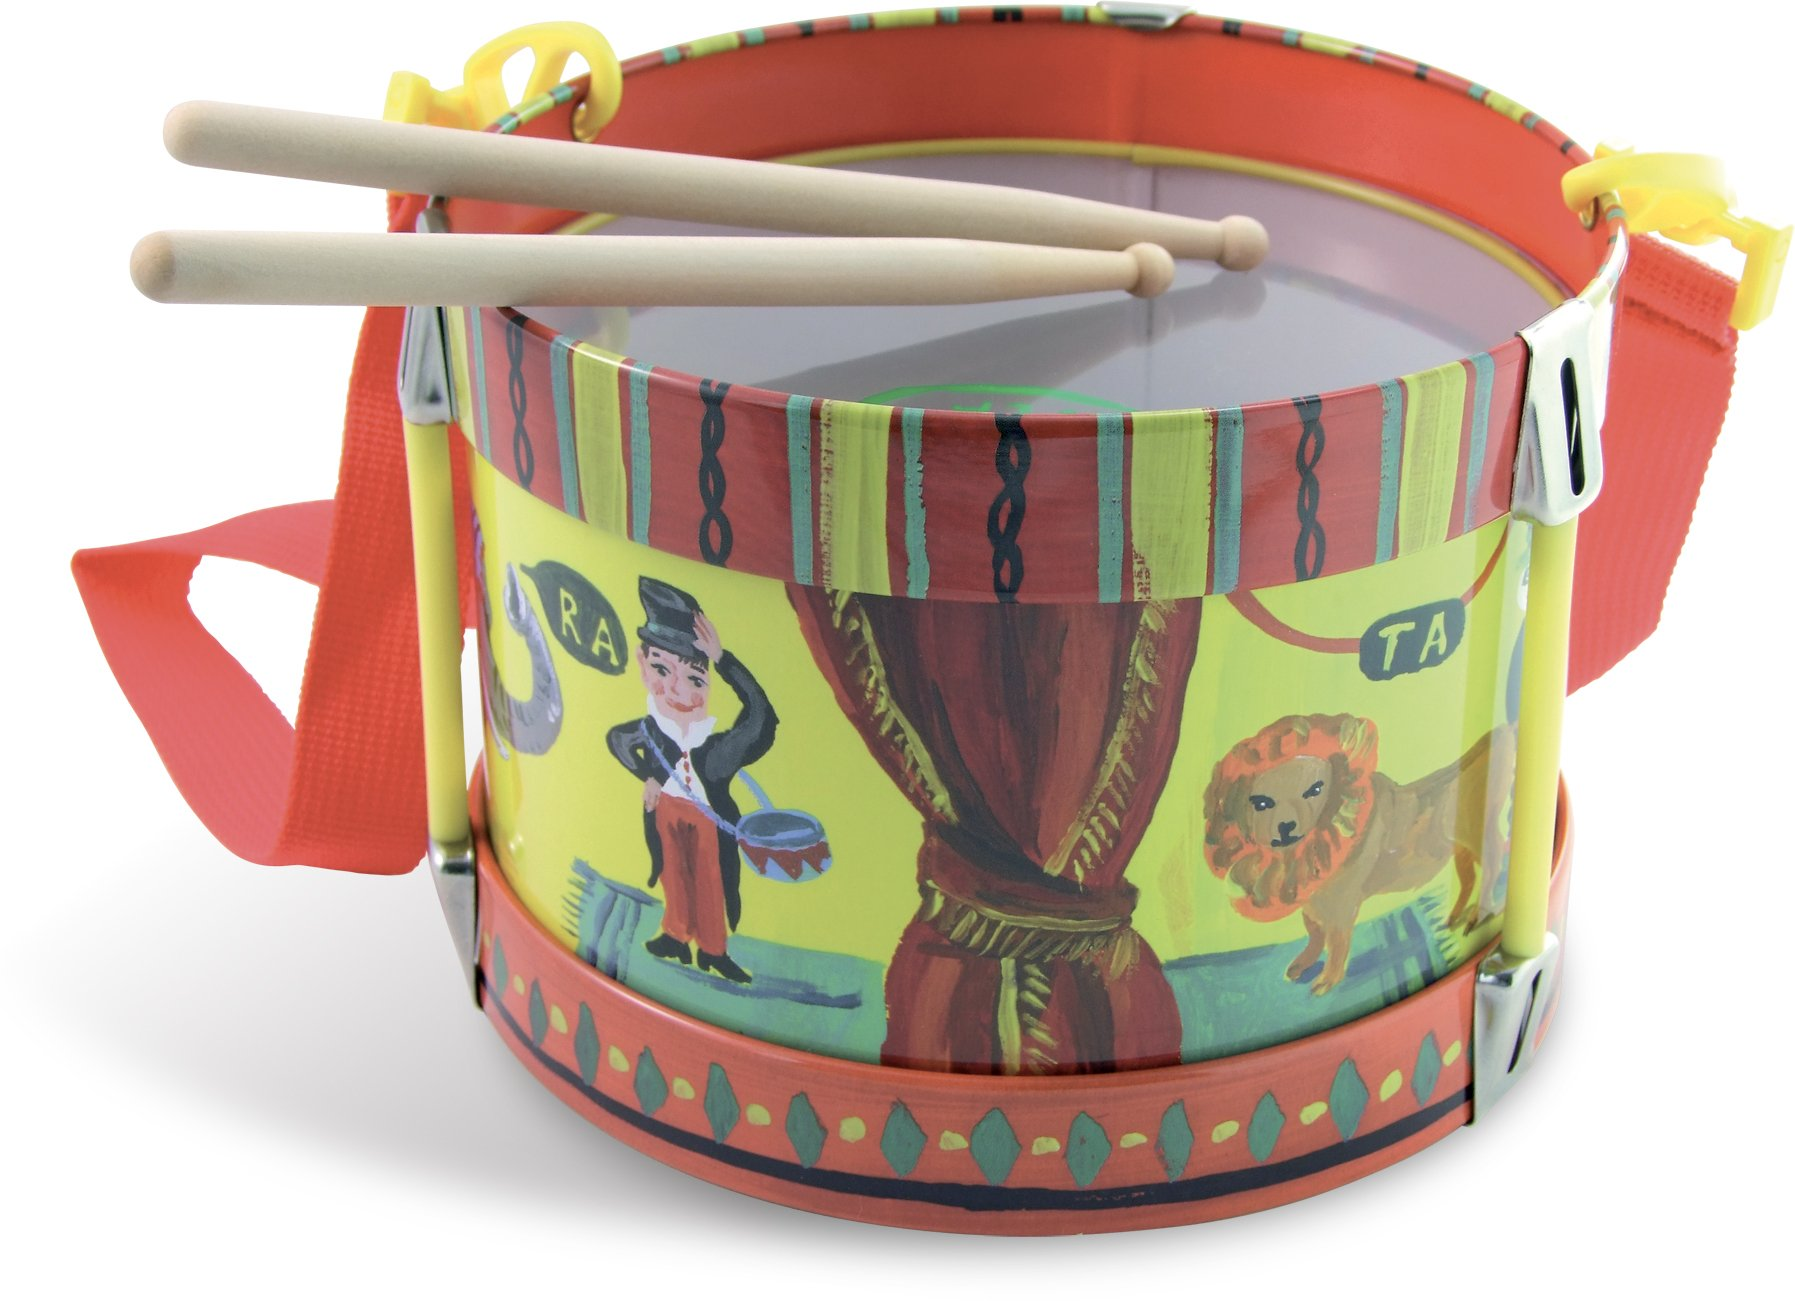 Vilac Tin Drum by Nathalie Lete by Vilac